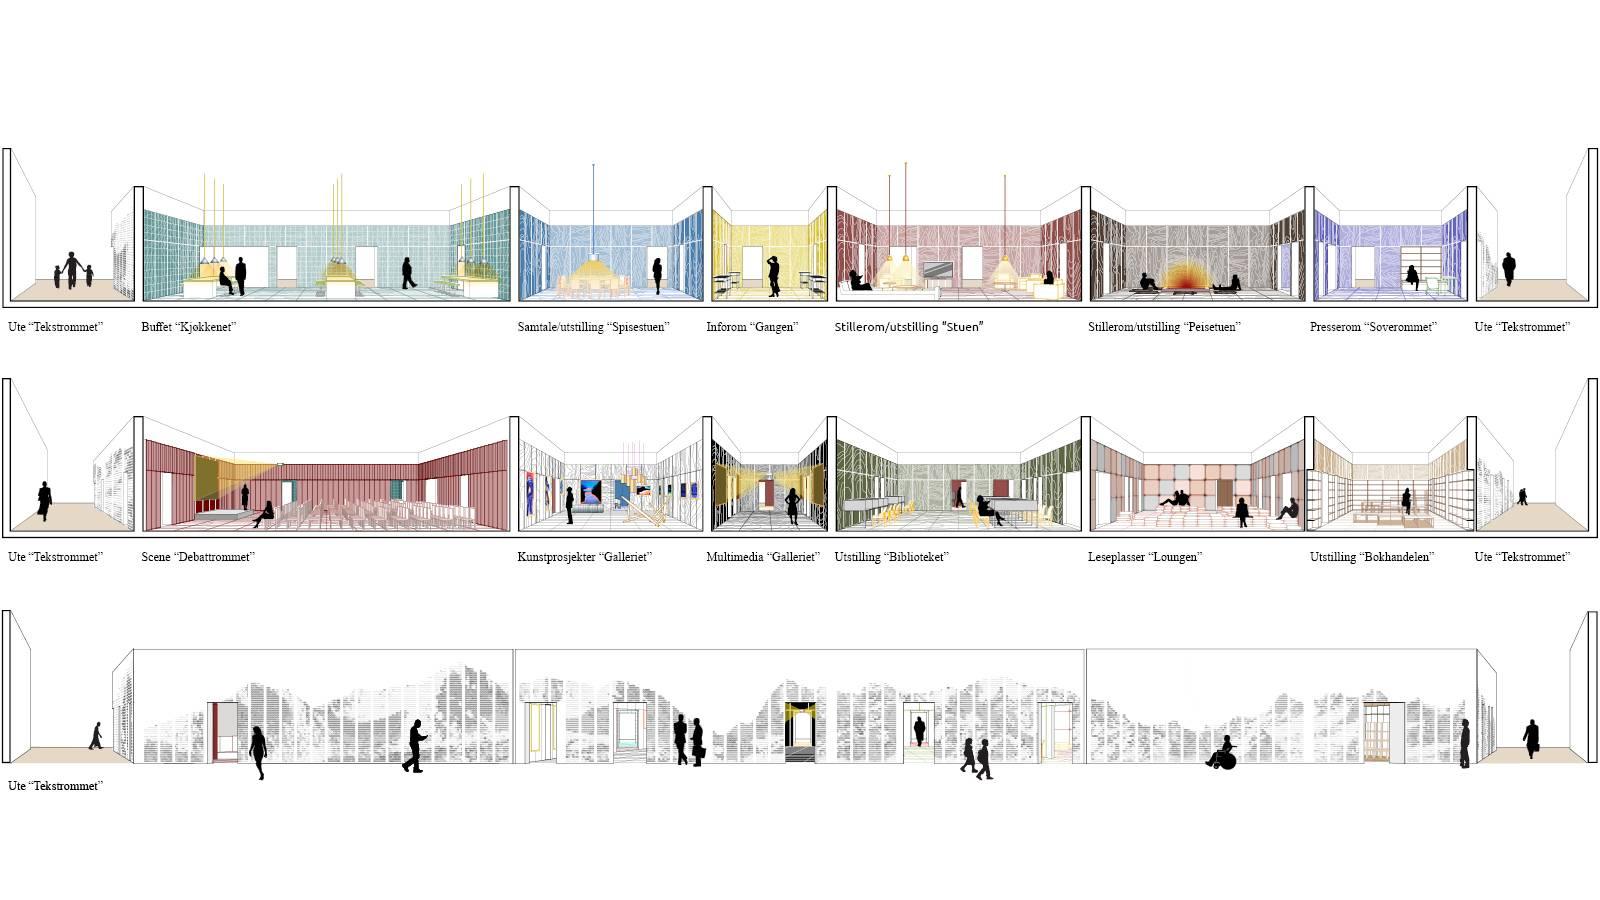 PAVILION ELEVATION AND SECTIONS - Frankfurt Book Fair Pavilion - SPOL Architects